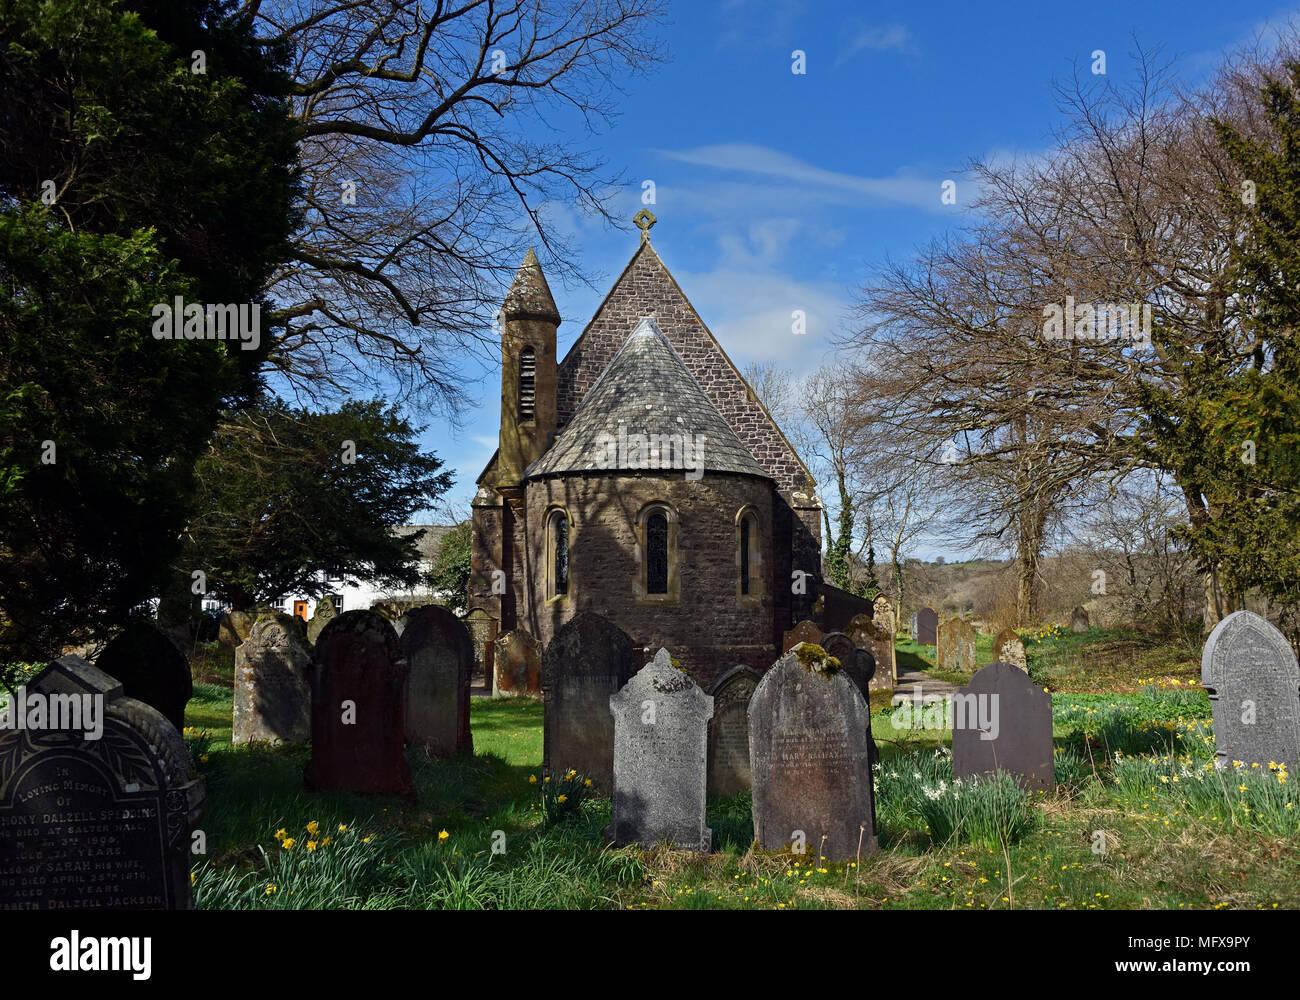 Church of Saint Mary. Ennerdale Bridge, Lake District National Park, Cumbria, England, United Kingdom, Europe. - Stock Image